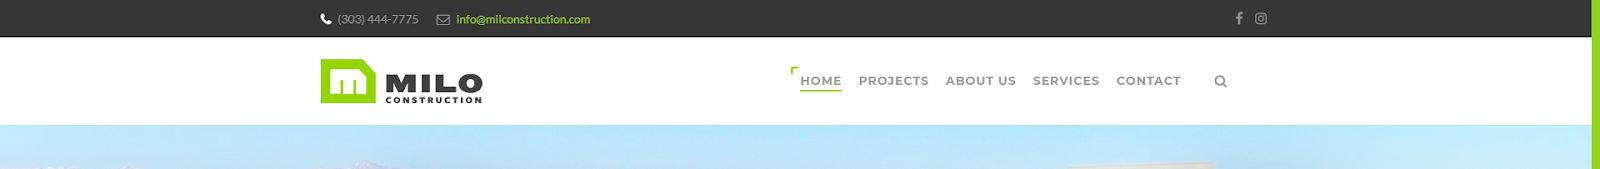 Construction Website Trends - Simple Navigation - Milo